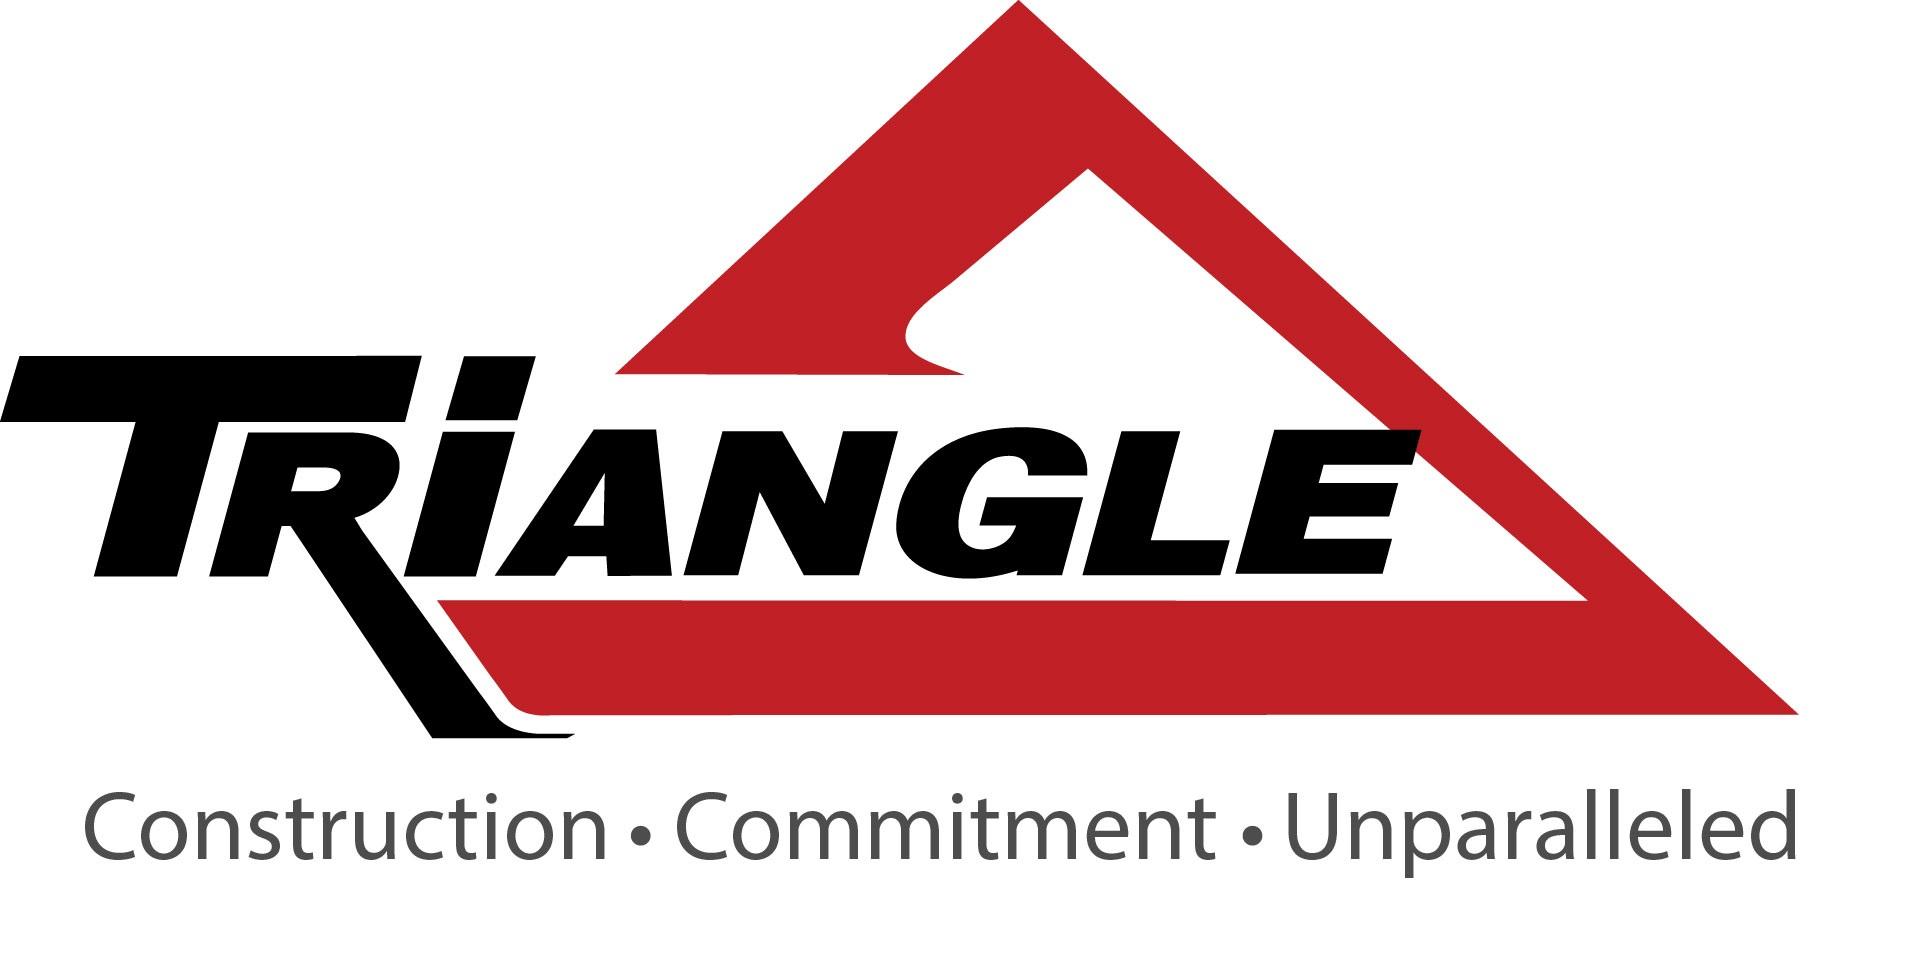 Triangle Associates